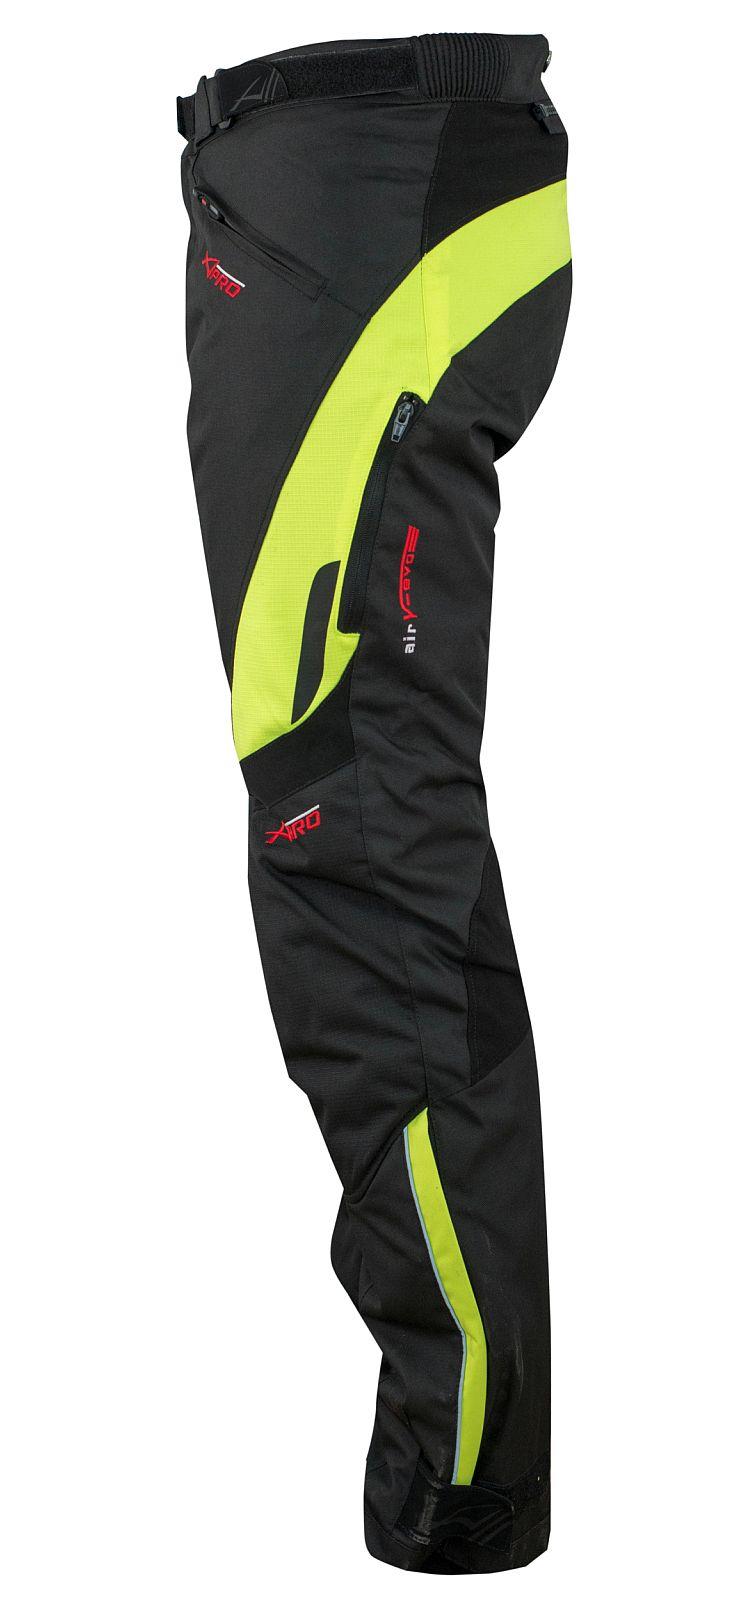 Pantaloni-Donna-Impermeabile-Moto-Imbottitura-Termica-Traspirante-Fluo miniature 8